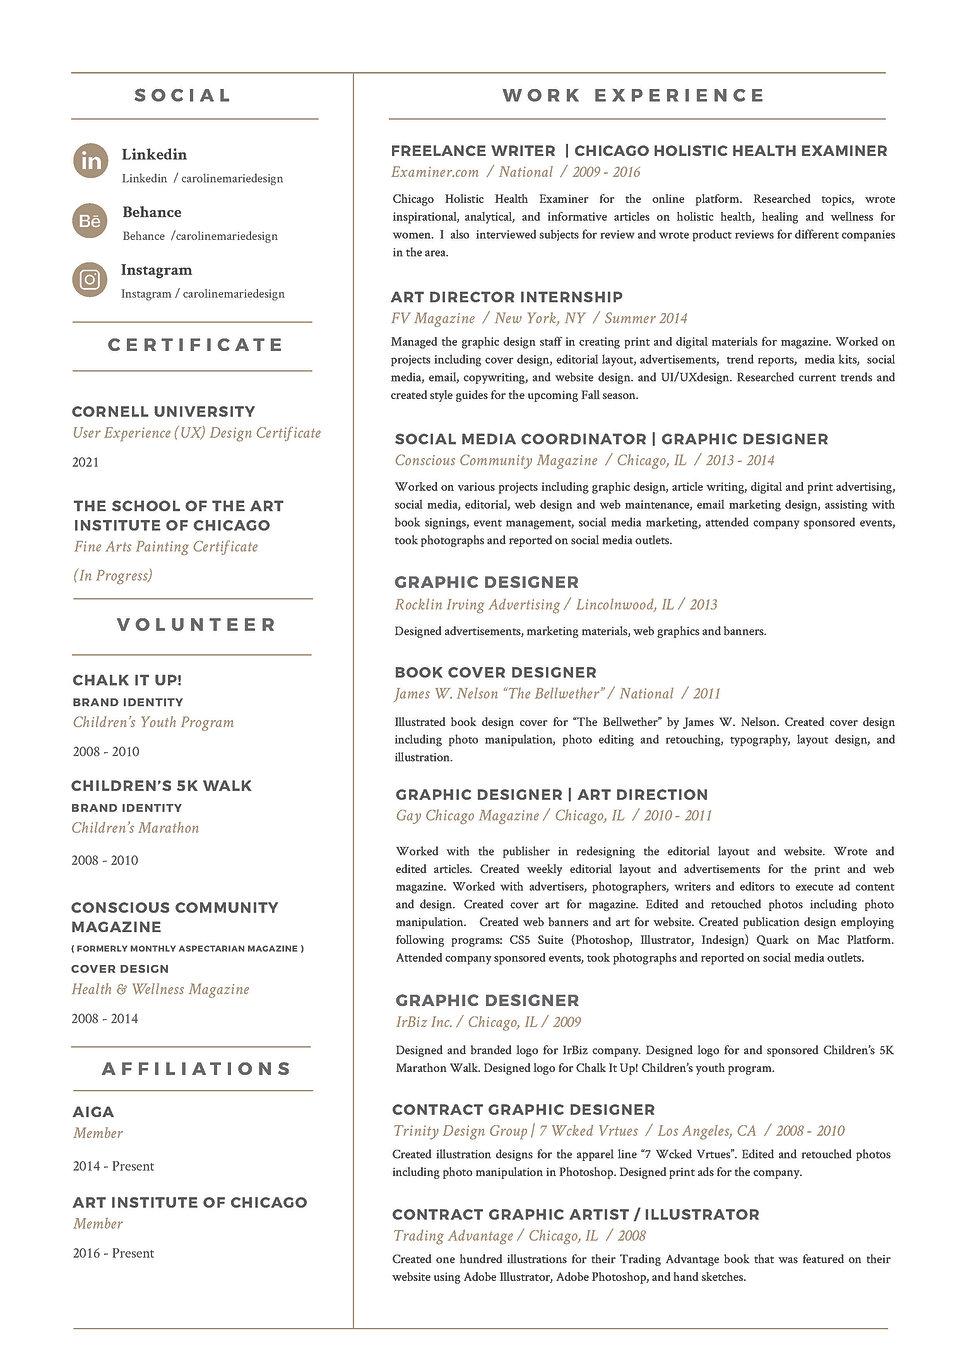 Resume_Caroline Dabrowski_2021_New_Page_2.jpg